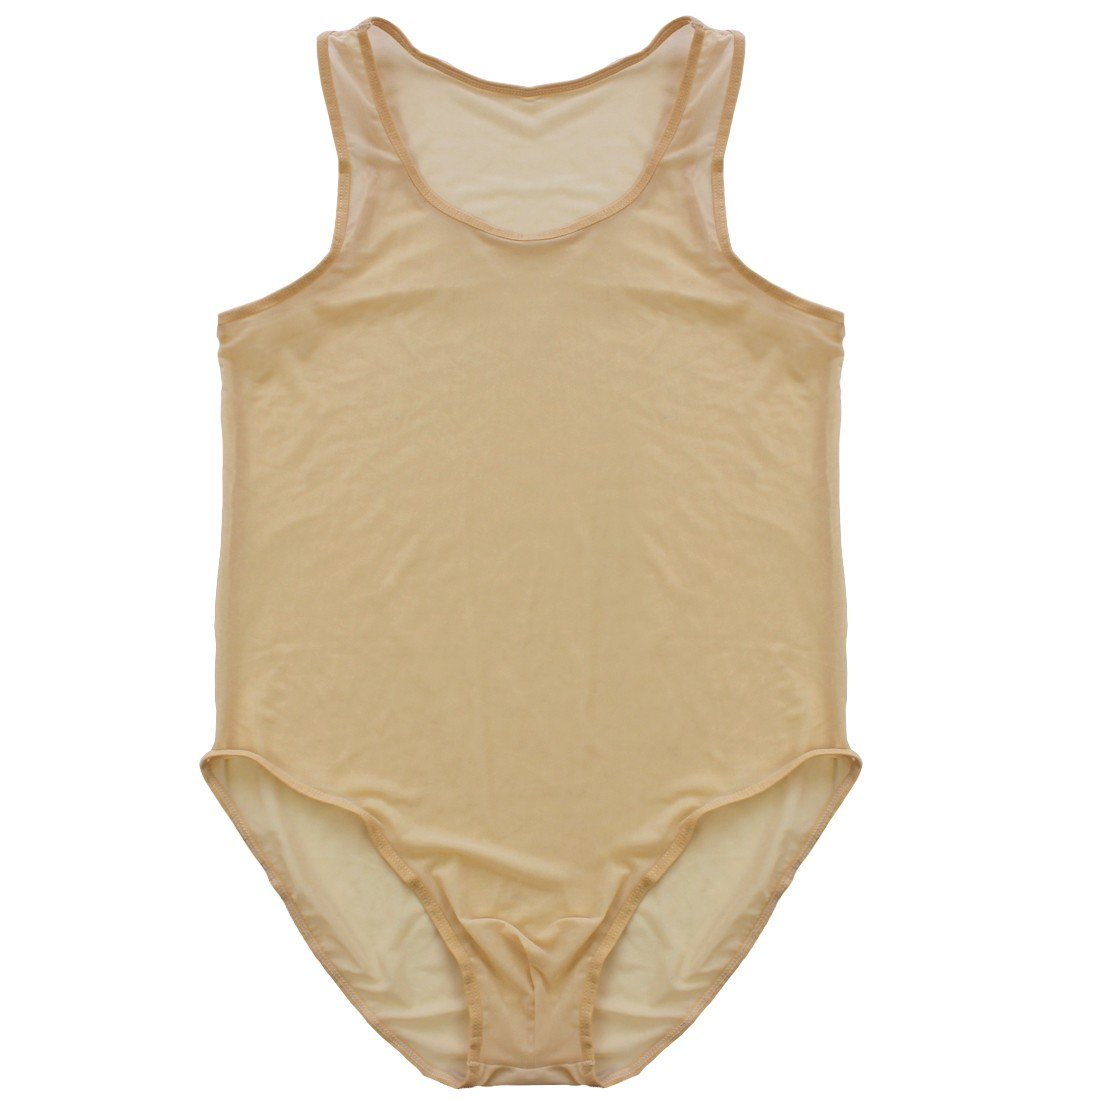 iEFiEL Men Soft Mesh Leotard Bodywear Brief Vest Underwear Wrestling Singlet Nightwear Nude Large